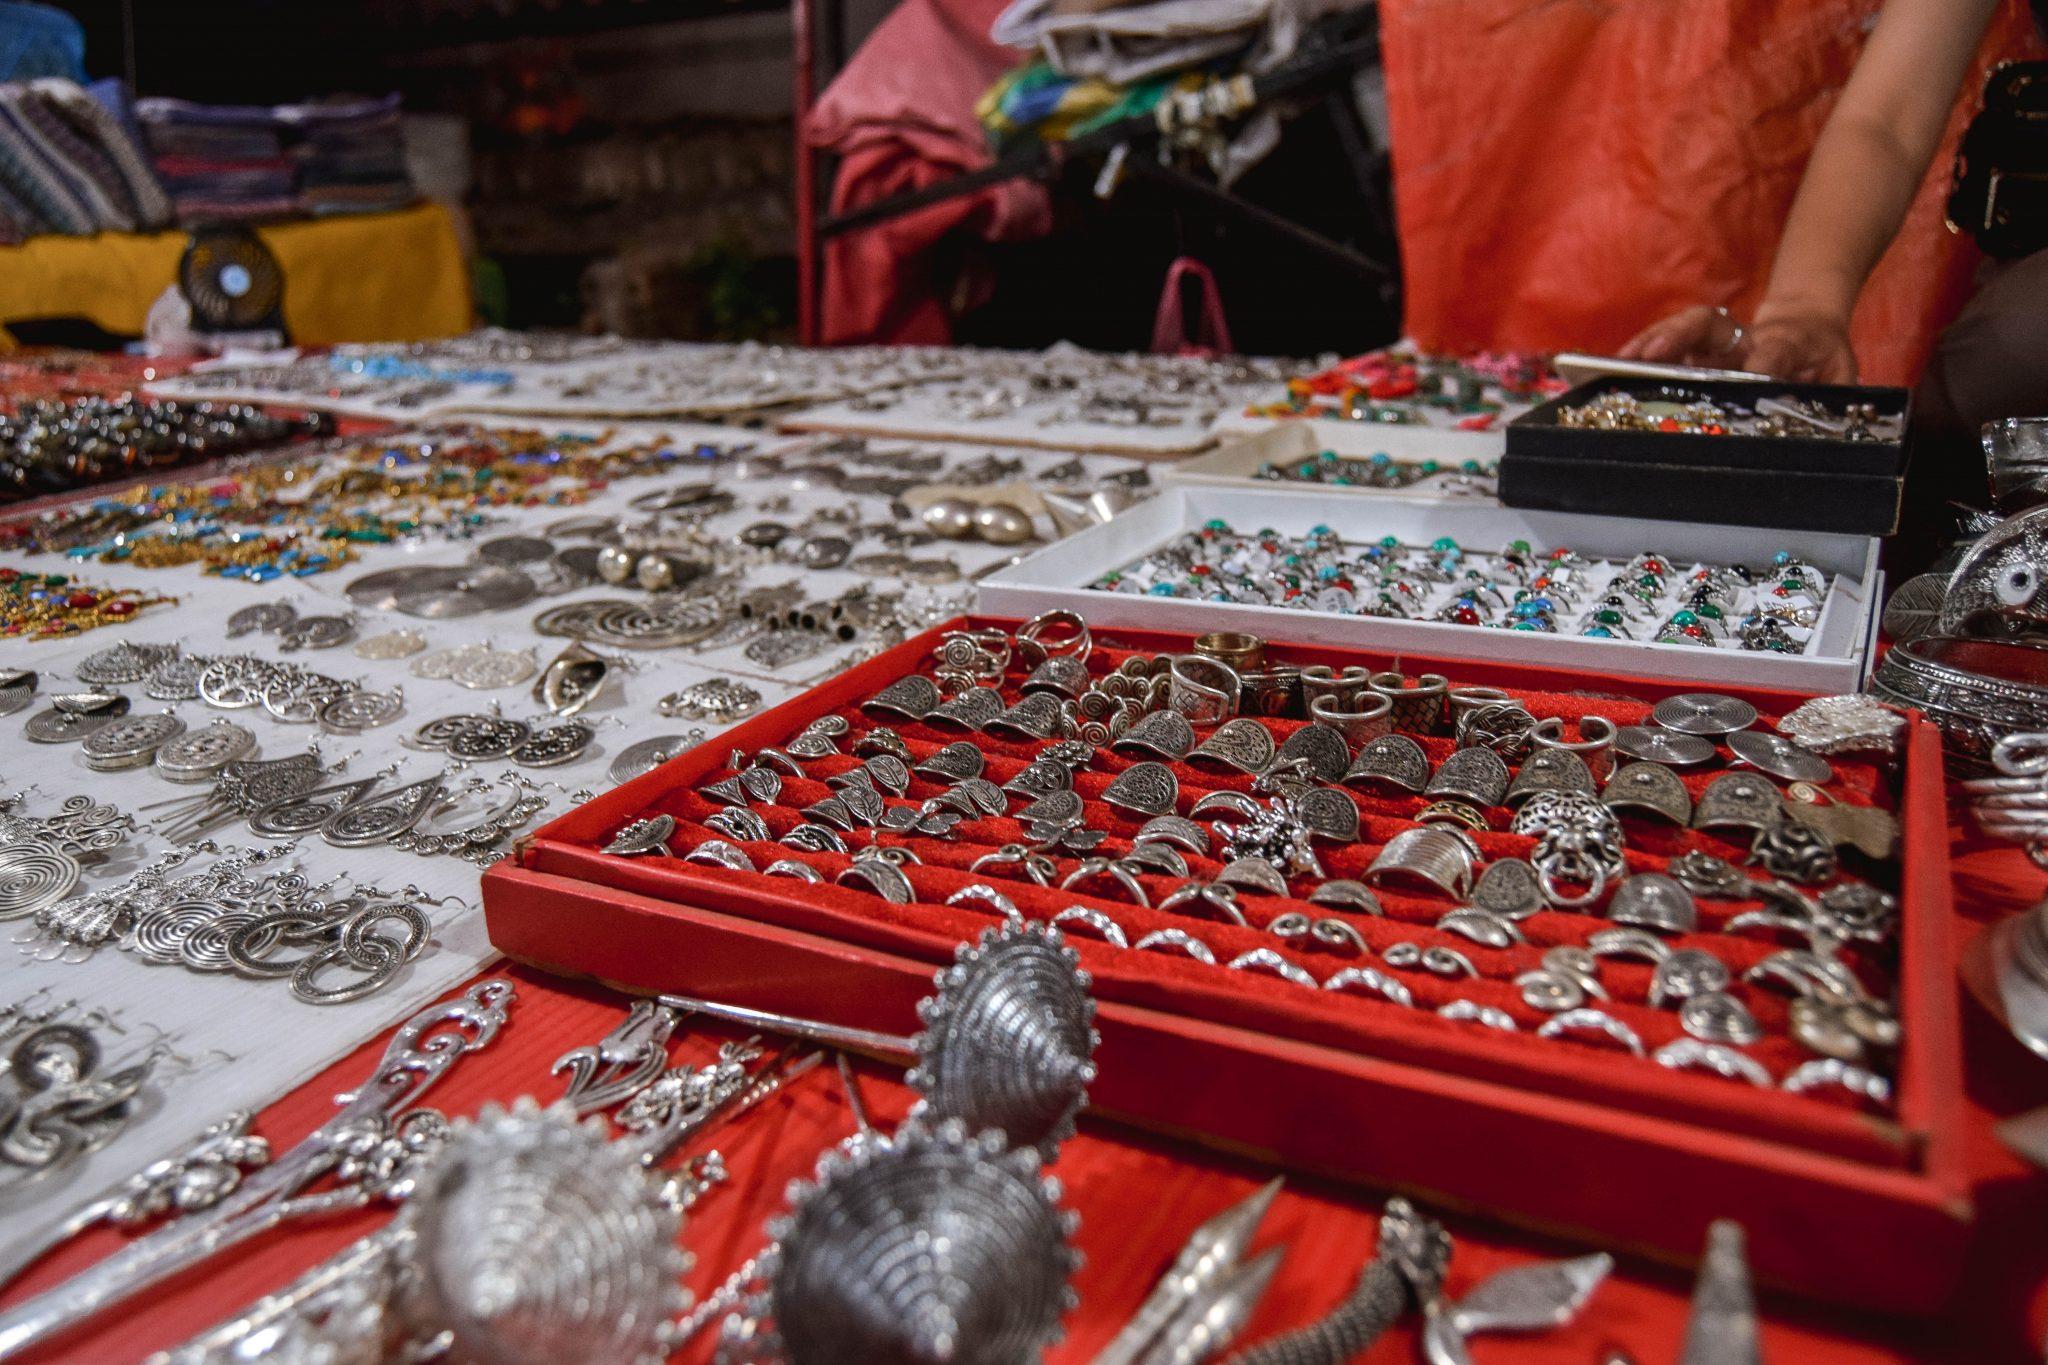 Wanderers & Warriors - Luang Prabang Night Market - The Best Market In Asia - Luang Prabang Attractions - Shopping In Luang Prabang Market - Laos Night Market